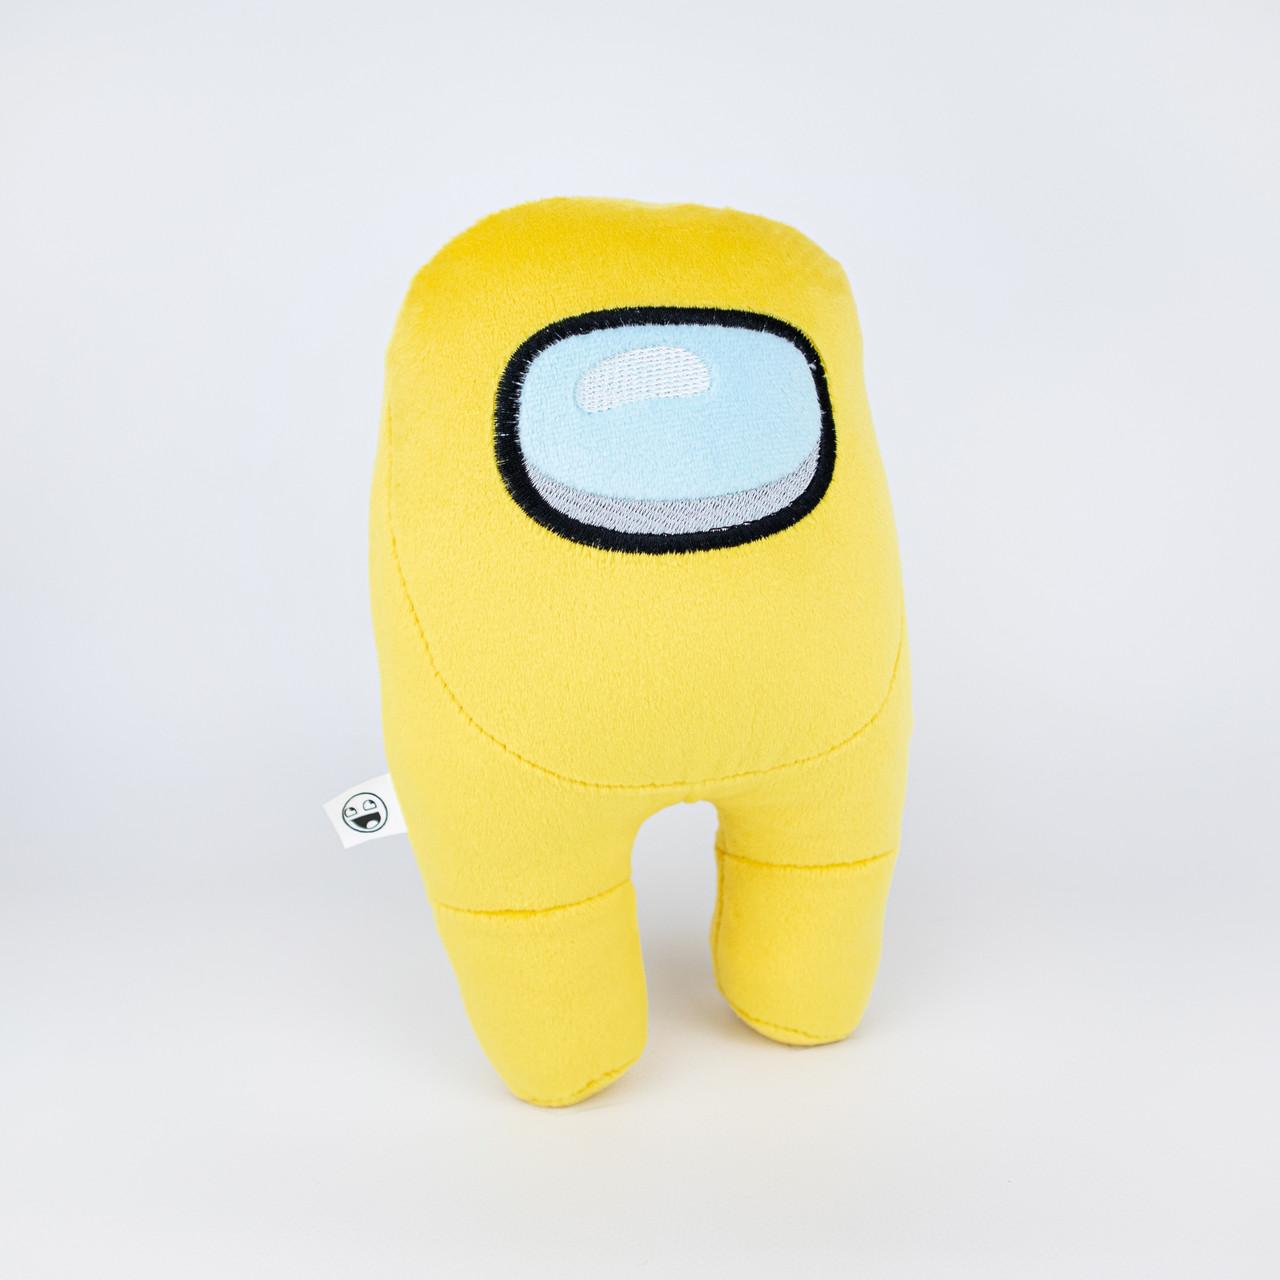 М'яка іграшка Weber Toys космонавт Among Us 20см жовтий (WT6673)